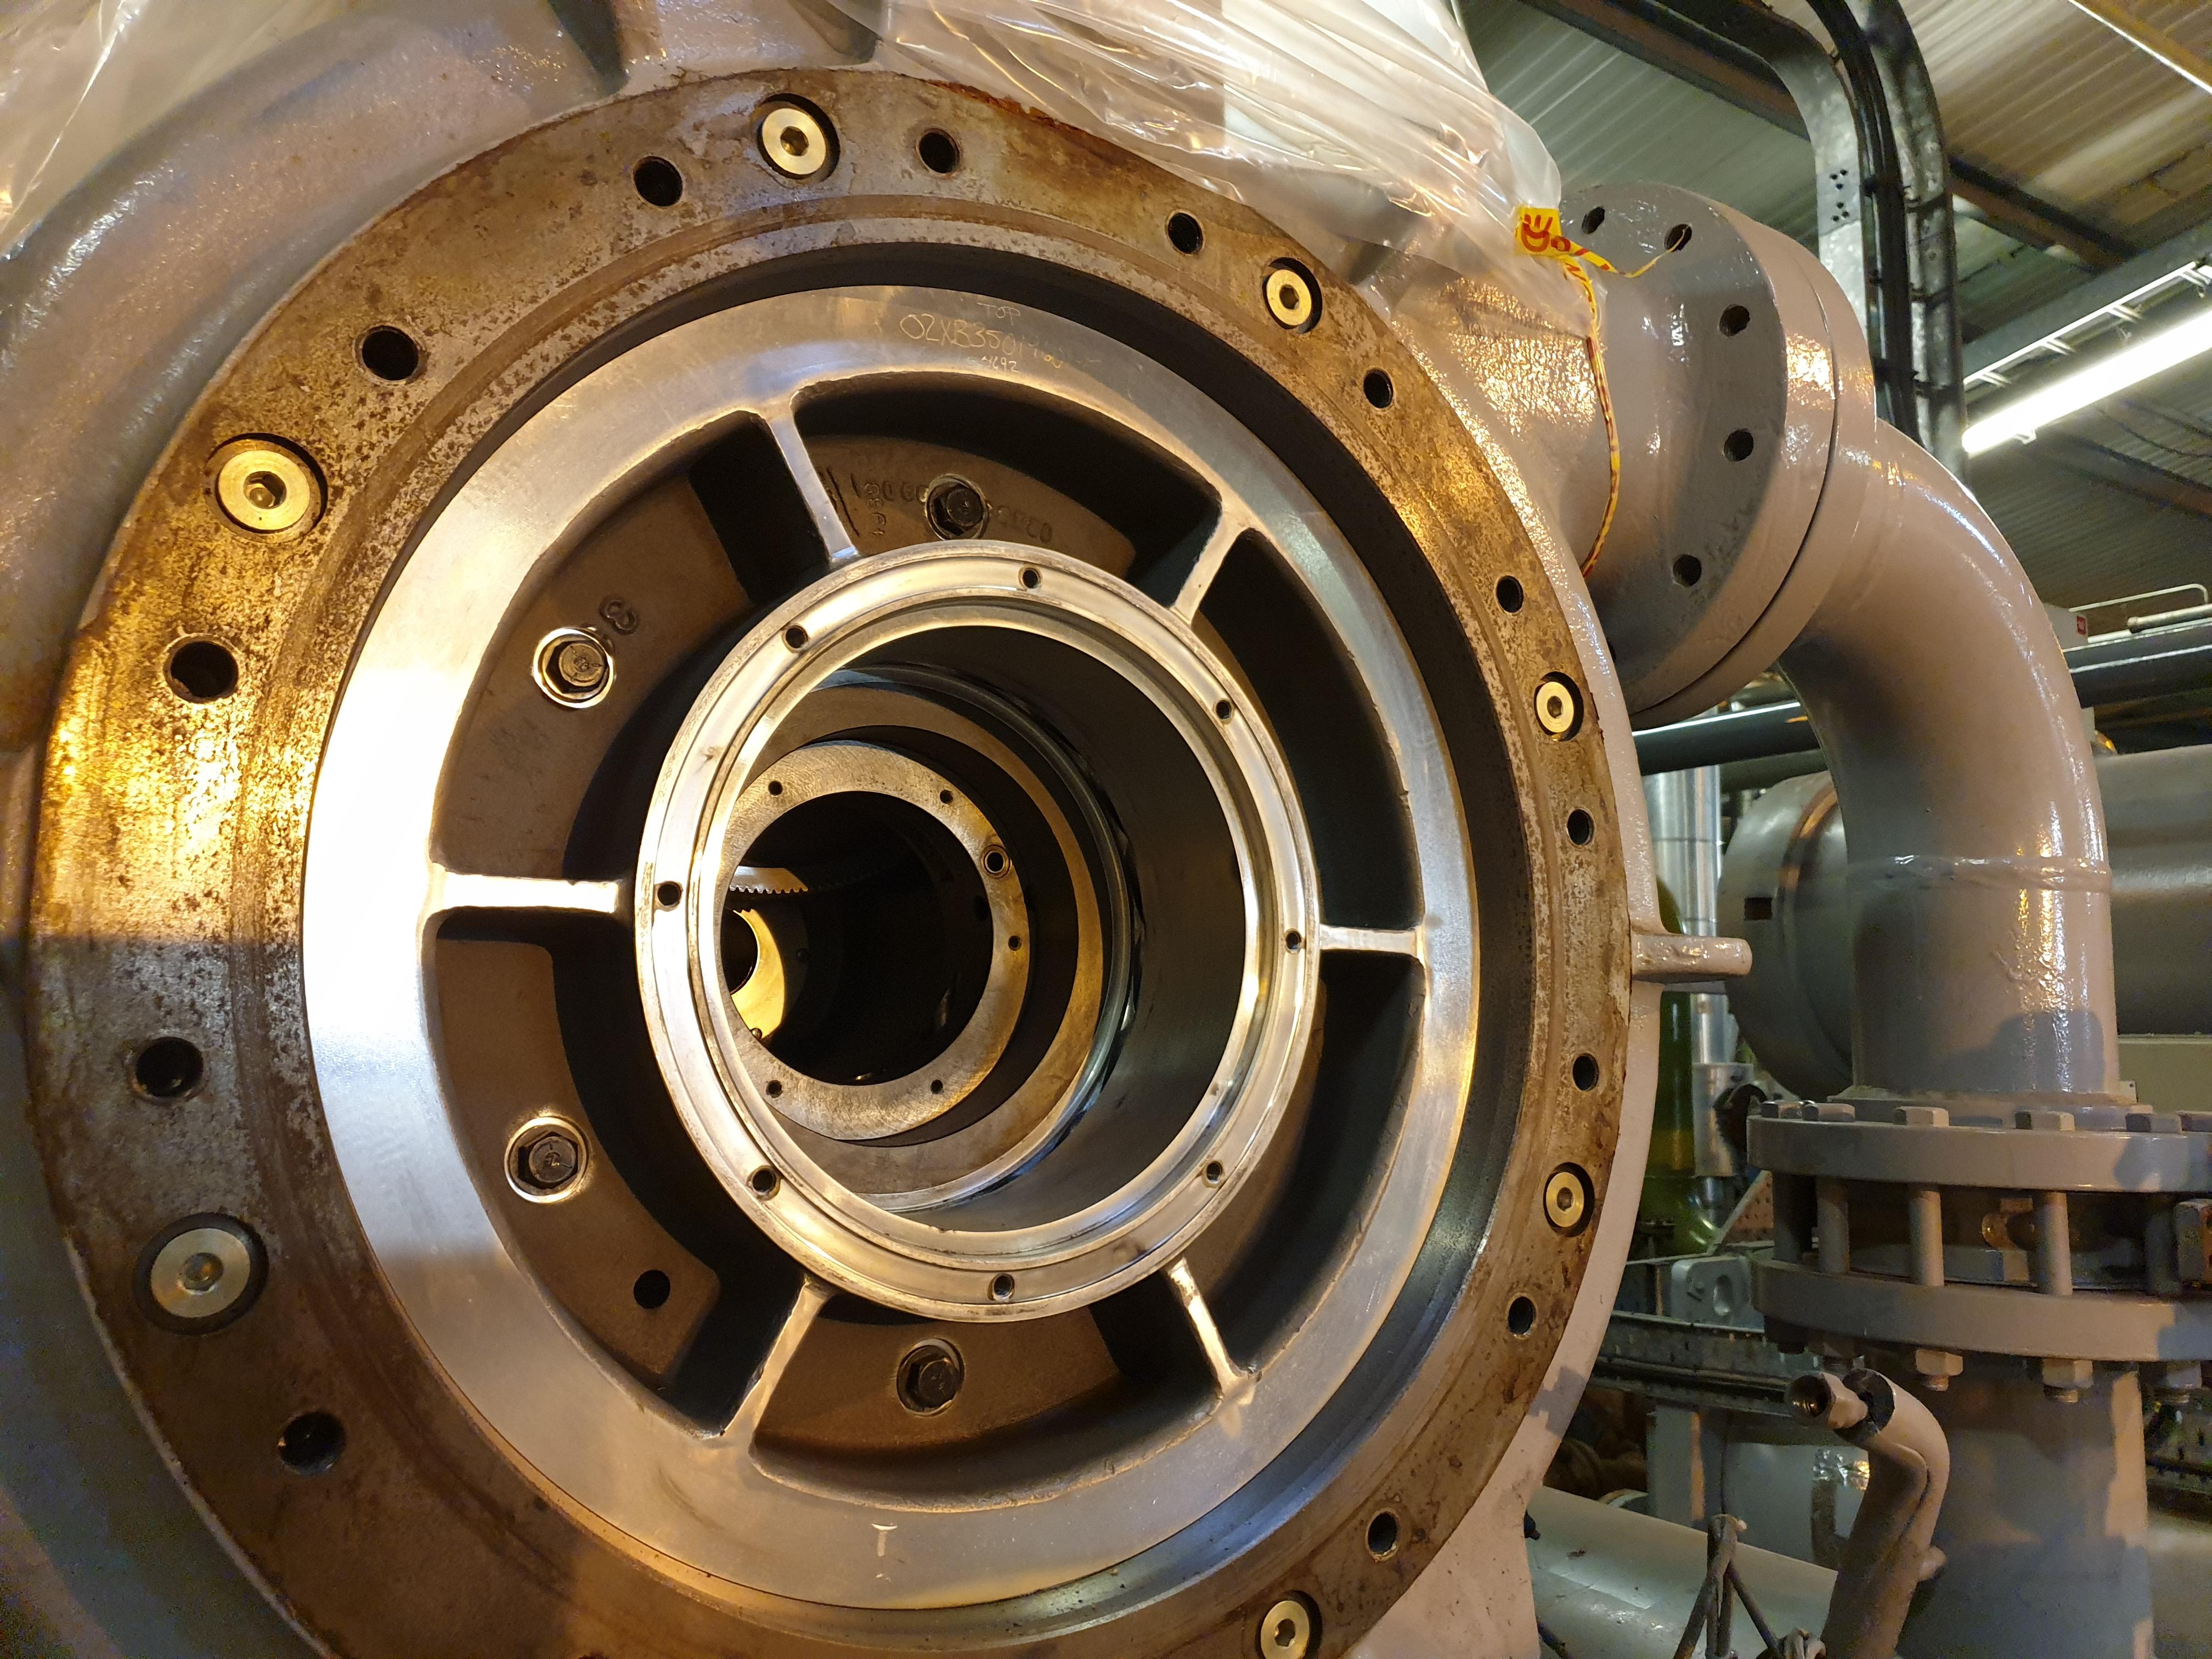 Centrifugal compressor remanufacturing showing inside the compressor